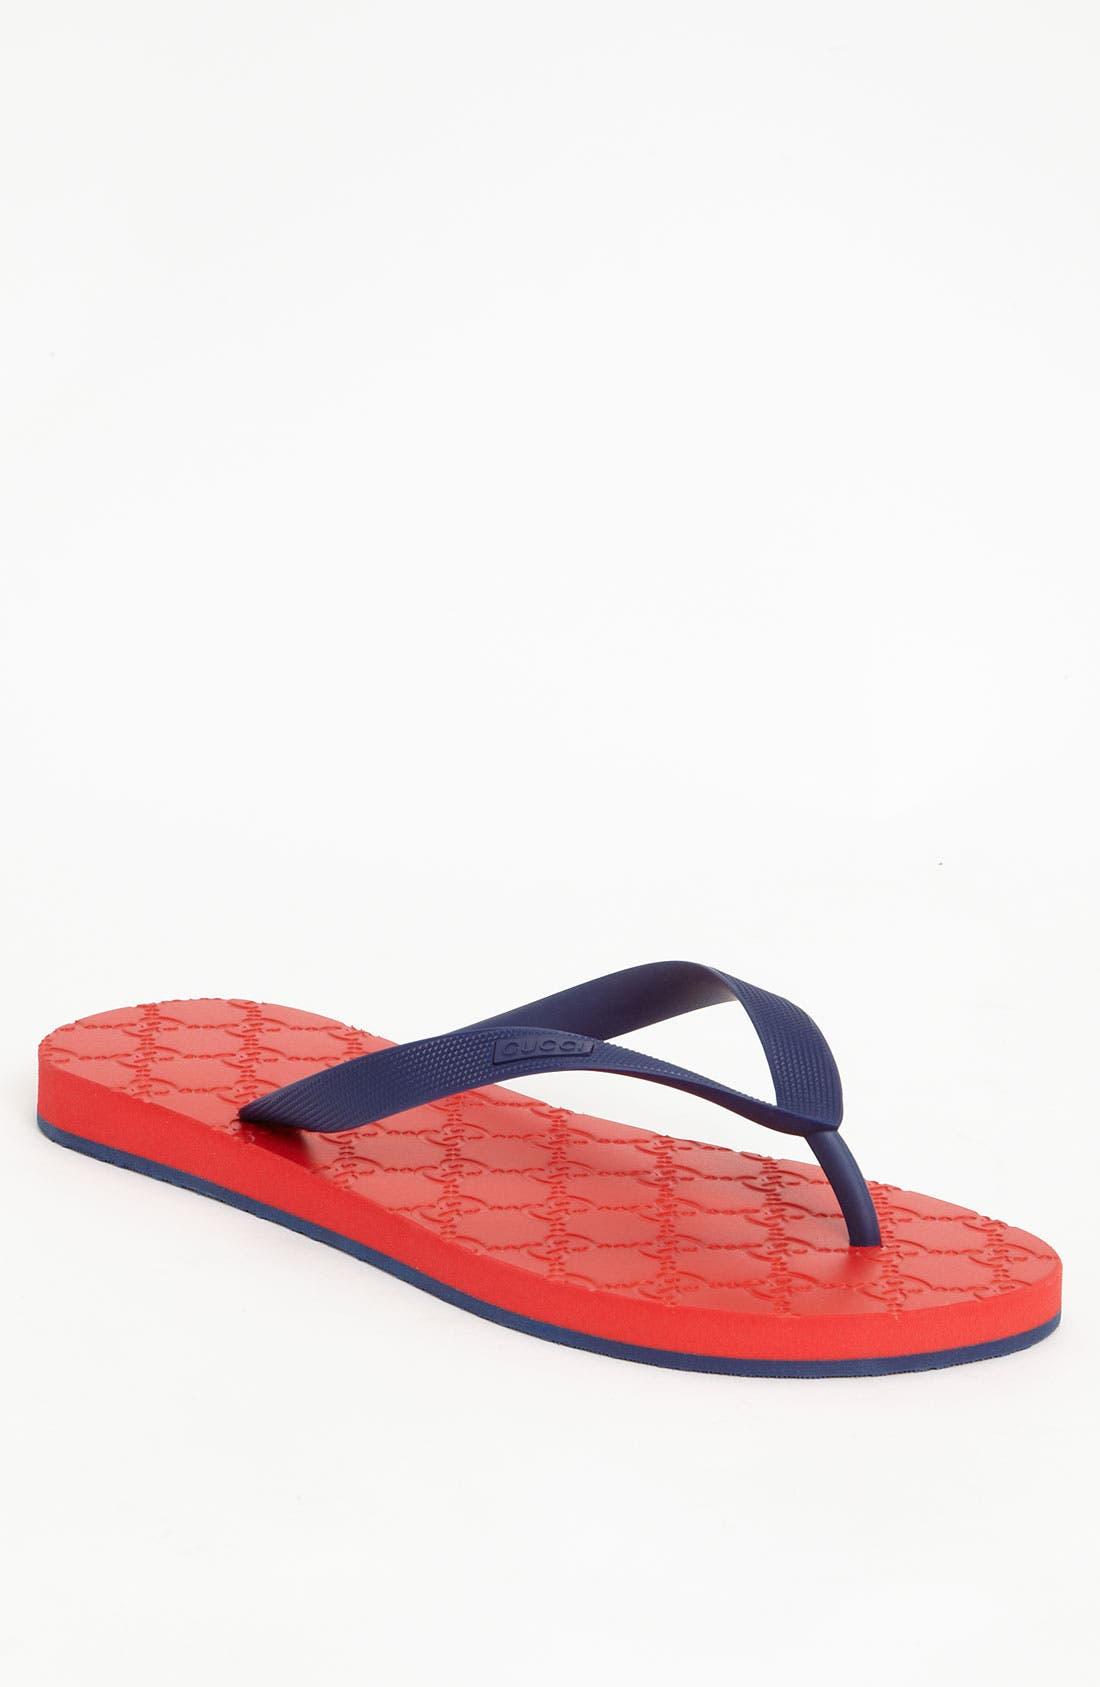 Alternate Image 1 Selected - Gucci 'Bedlam' Flip Flop